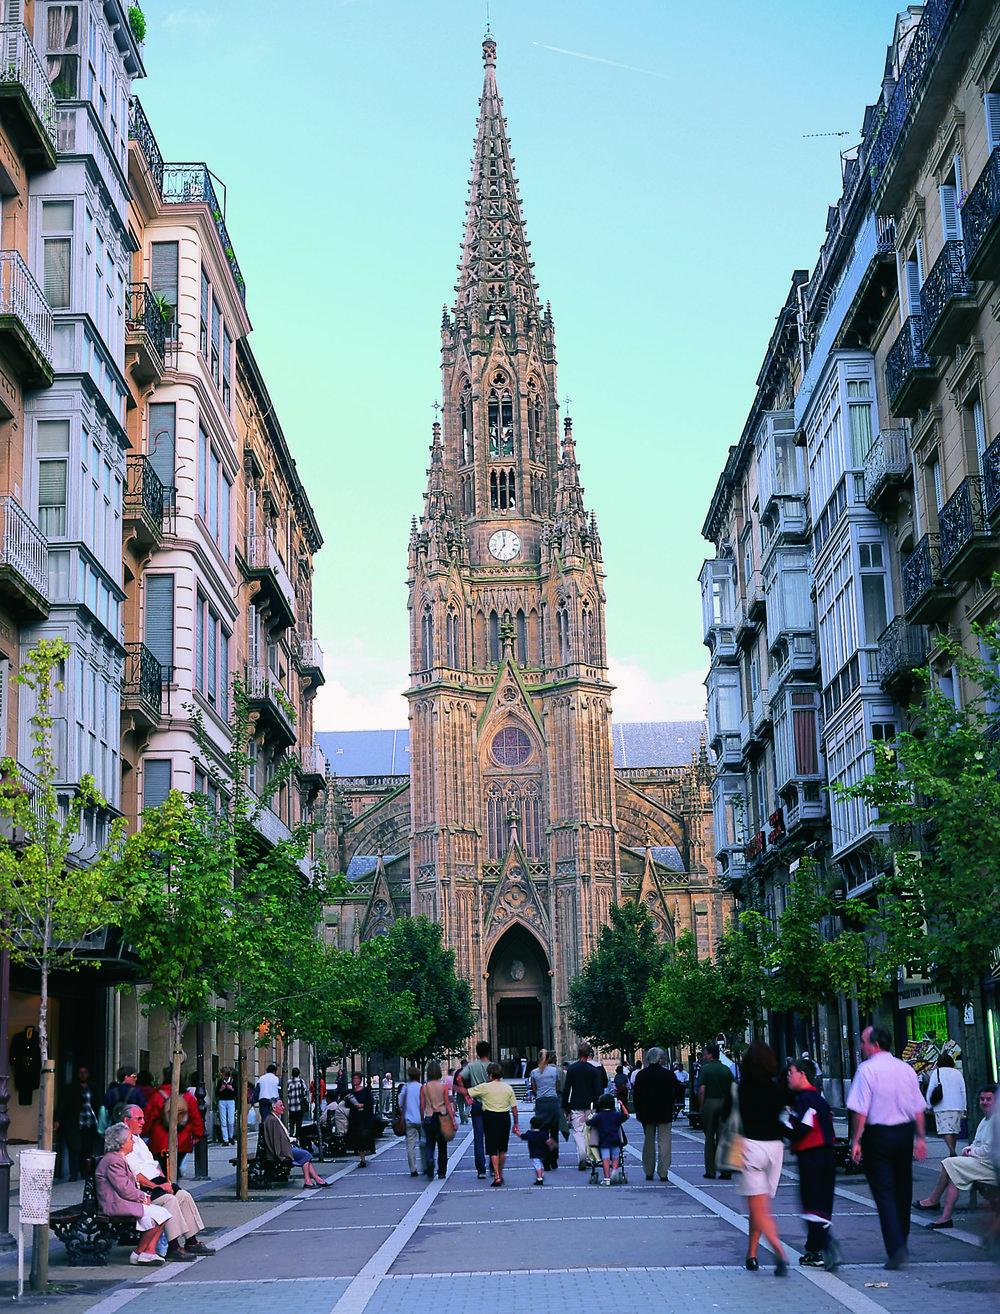 Catedral del Buen Pastor y Calle LoyolaSan Sebastián - 2 MB © Tourist Office of Spain in New York (TURESPAÑA).jpg